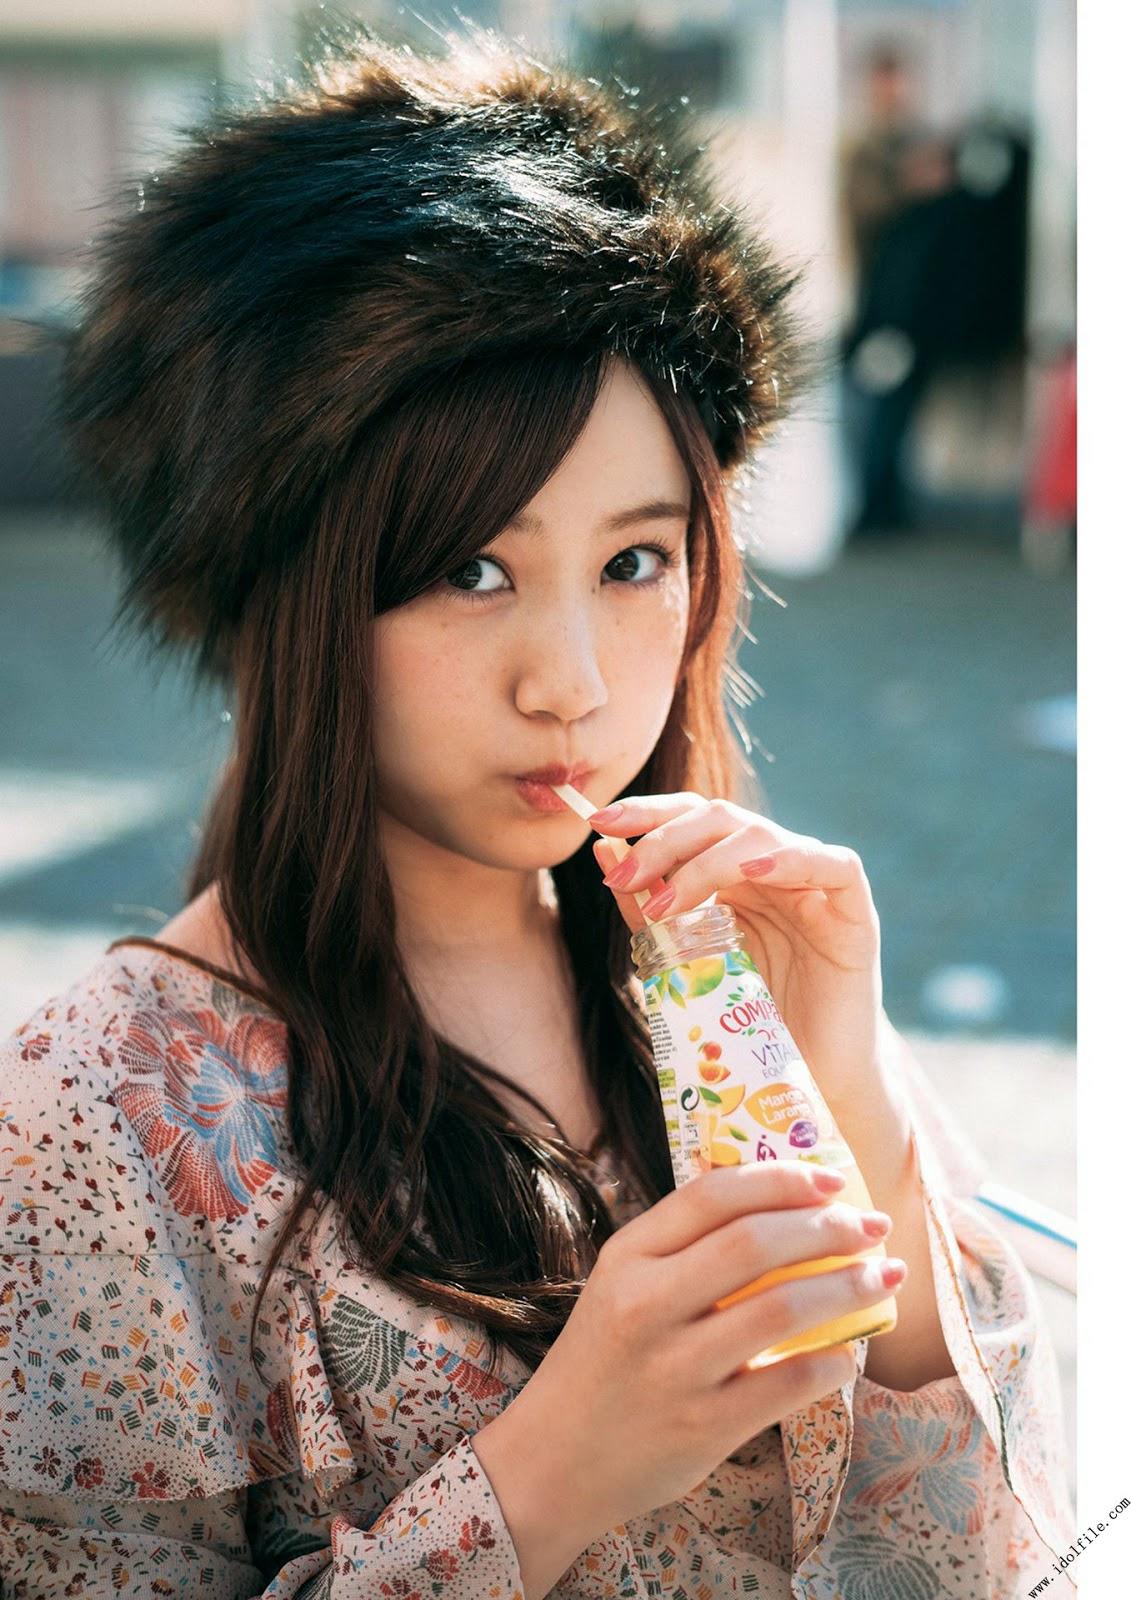 Hoshino Minami 星野みなみ, BRODY 2018 No.04 (ブロディ 2018年4月号)